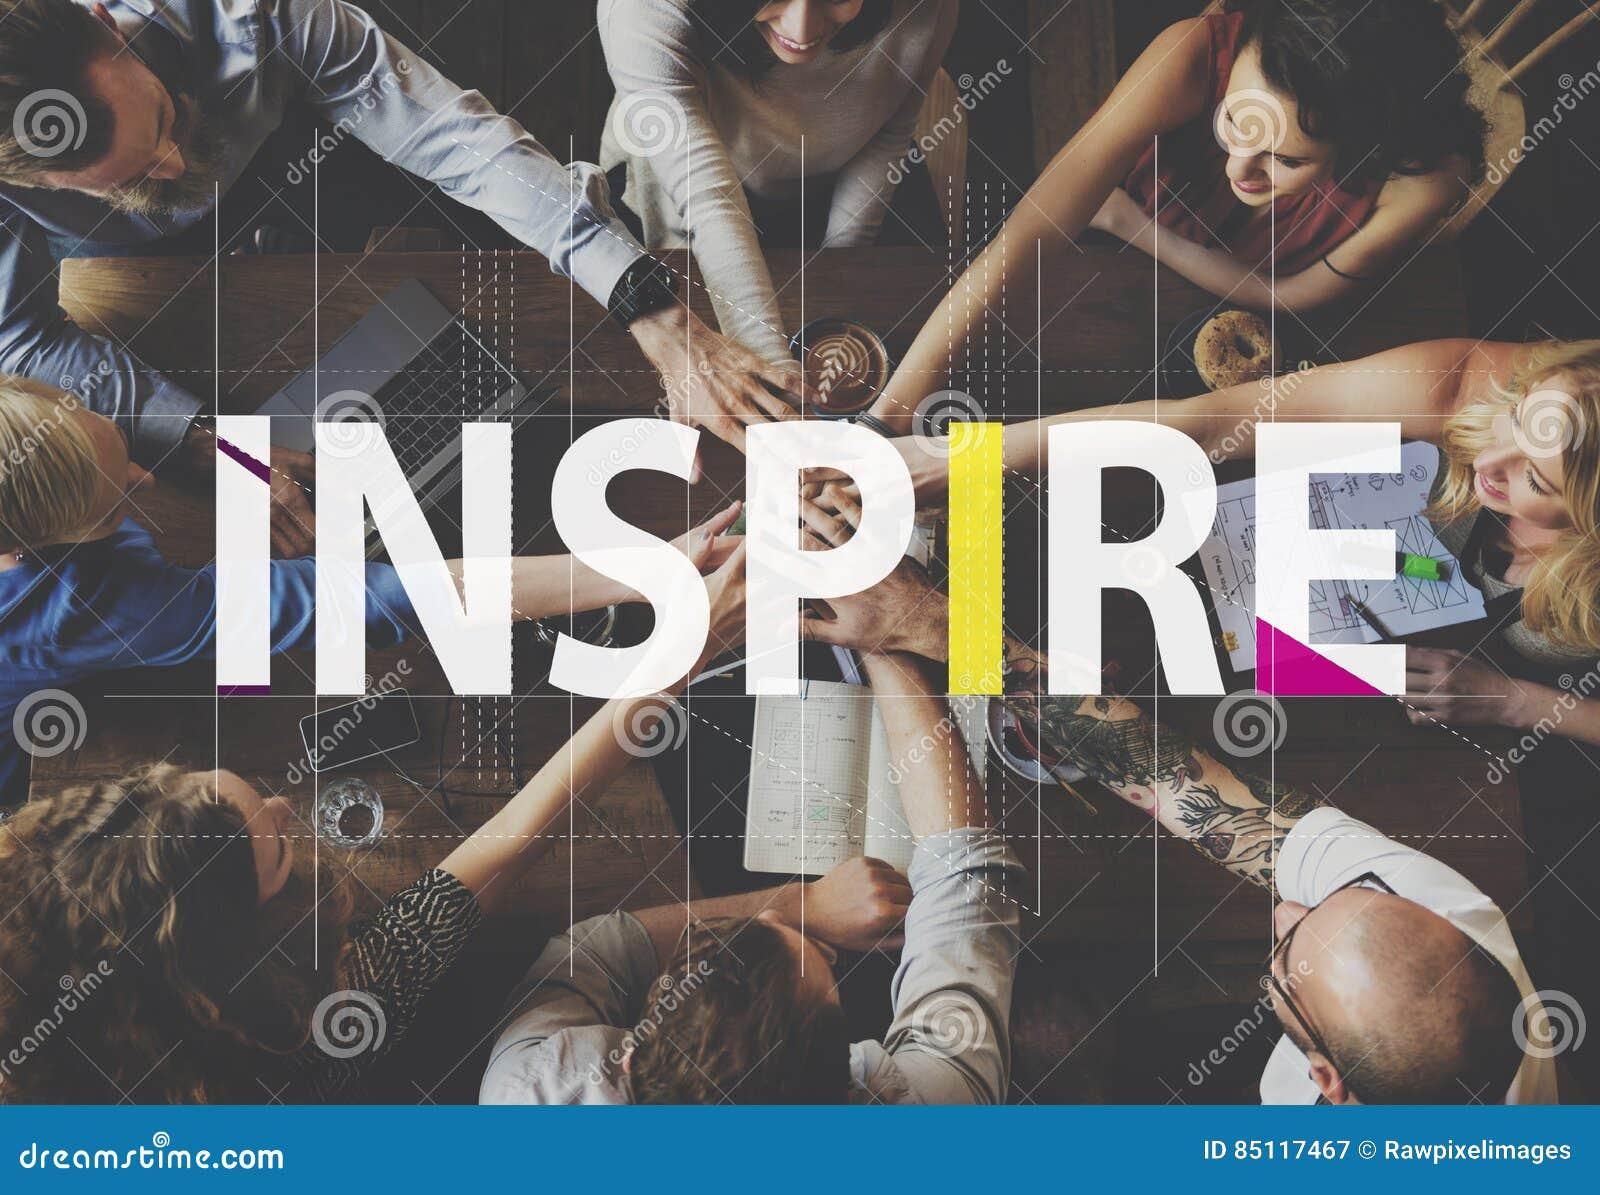 Inspire Ideas Creative People Graphic Concept